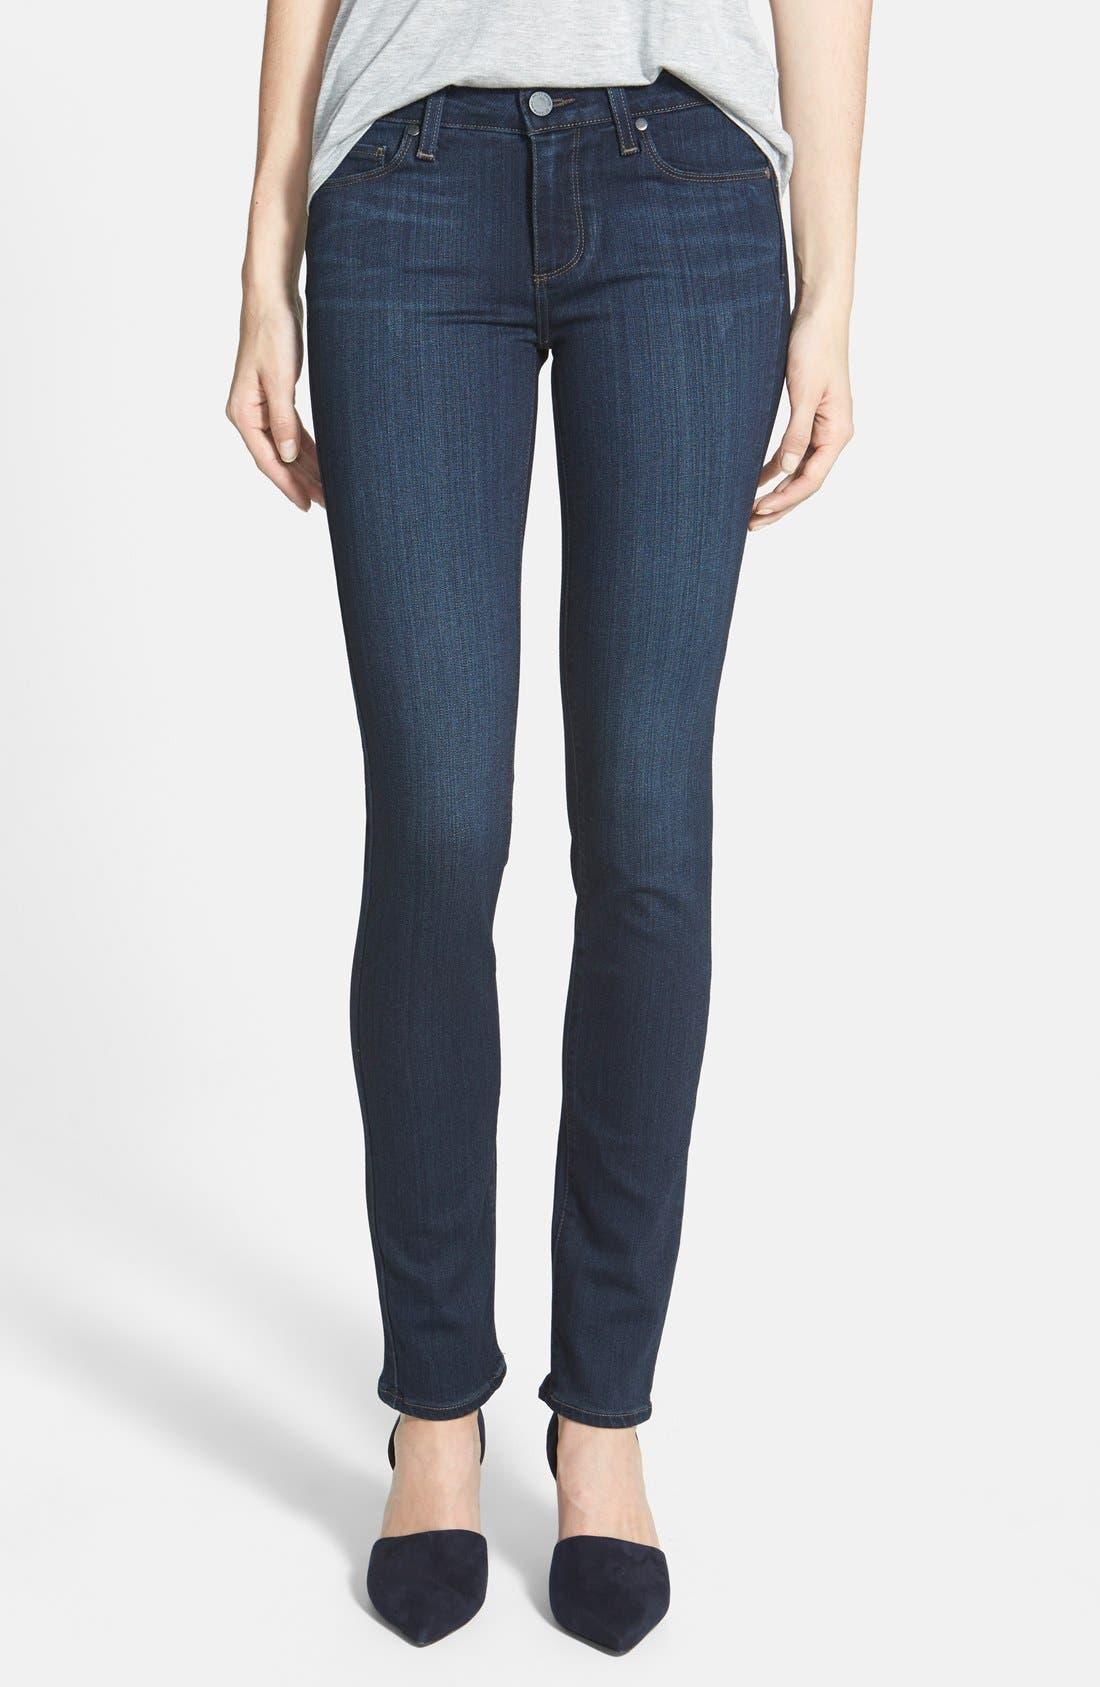 Main Image - Paige Denim 'Skyline' Skinny Jeans (Cameron)